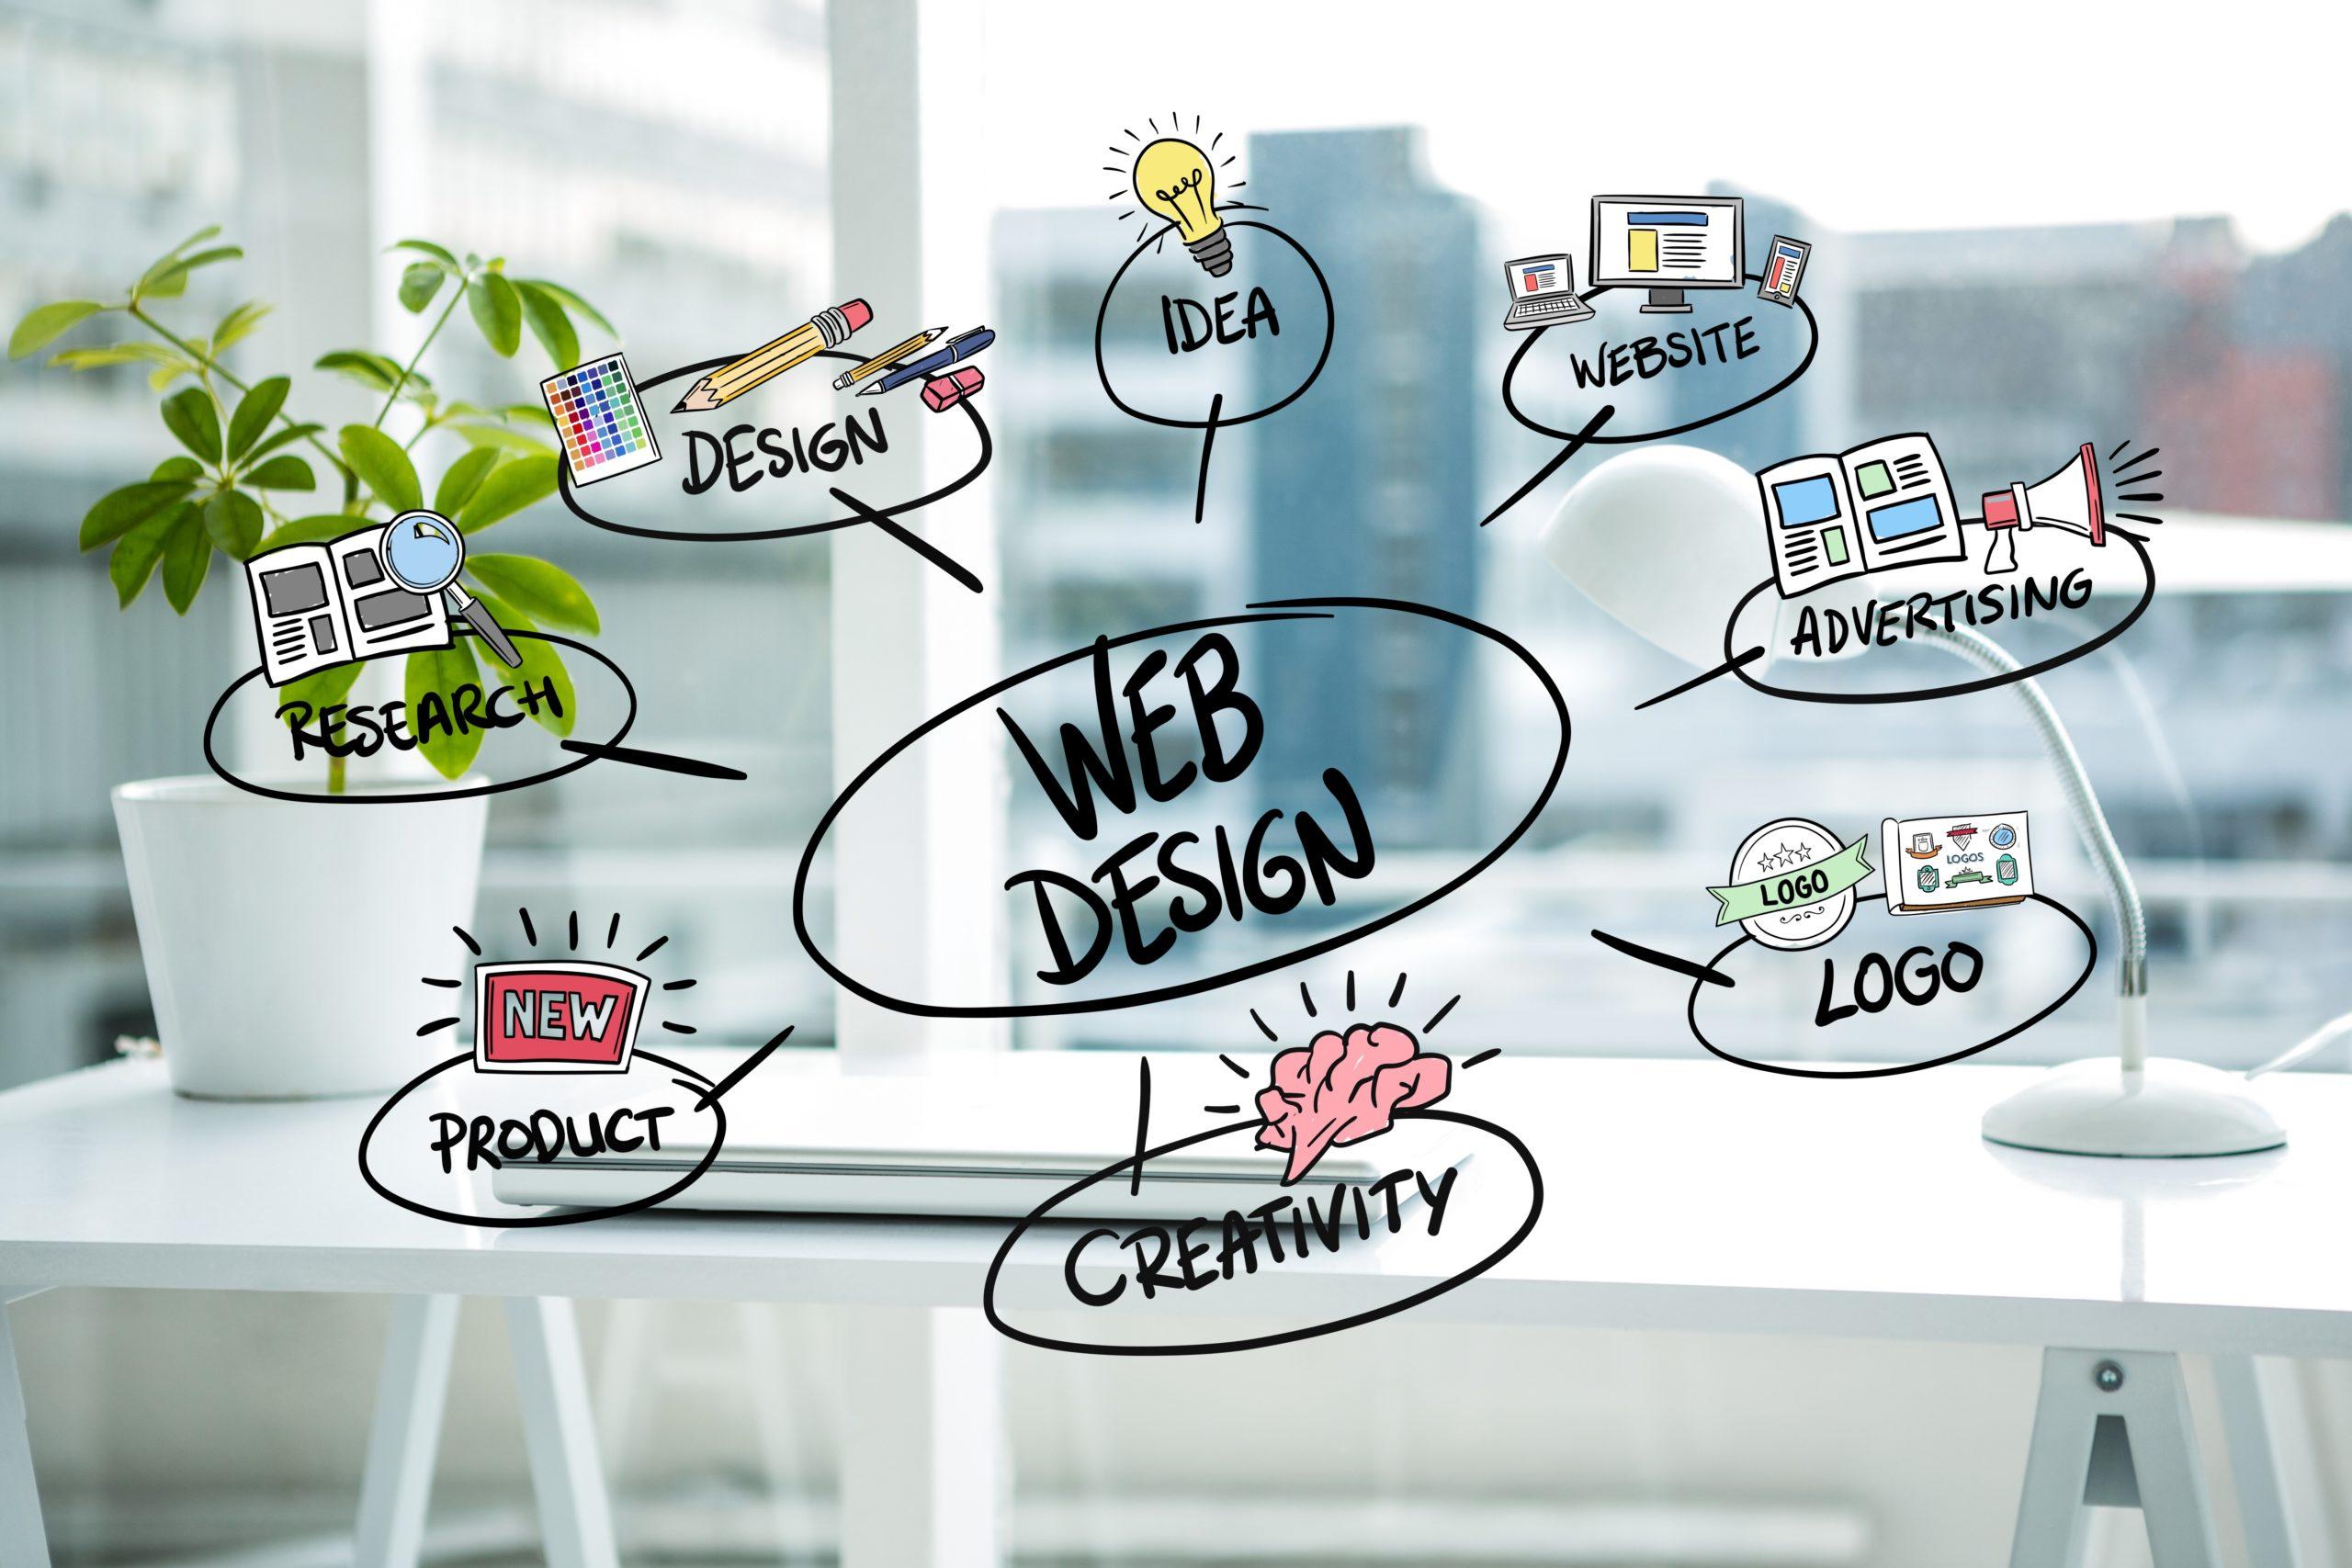 Logo Design Deck-Web Design or Web Development